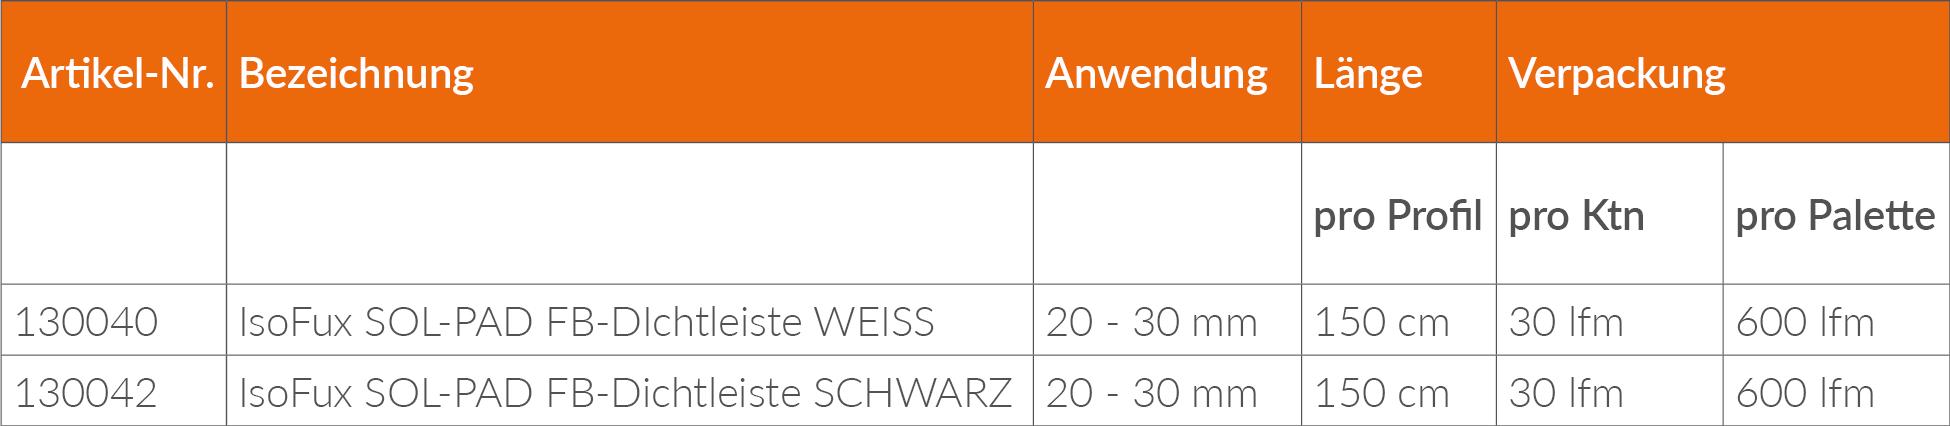 SOL-PAD_FB_Dichtleiste_Lieferprogramm